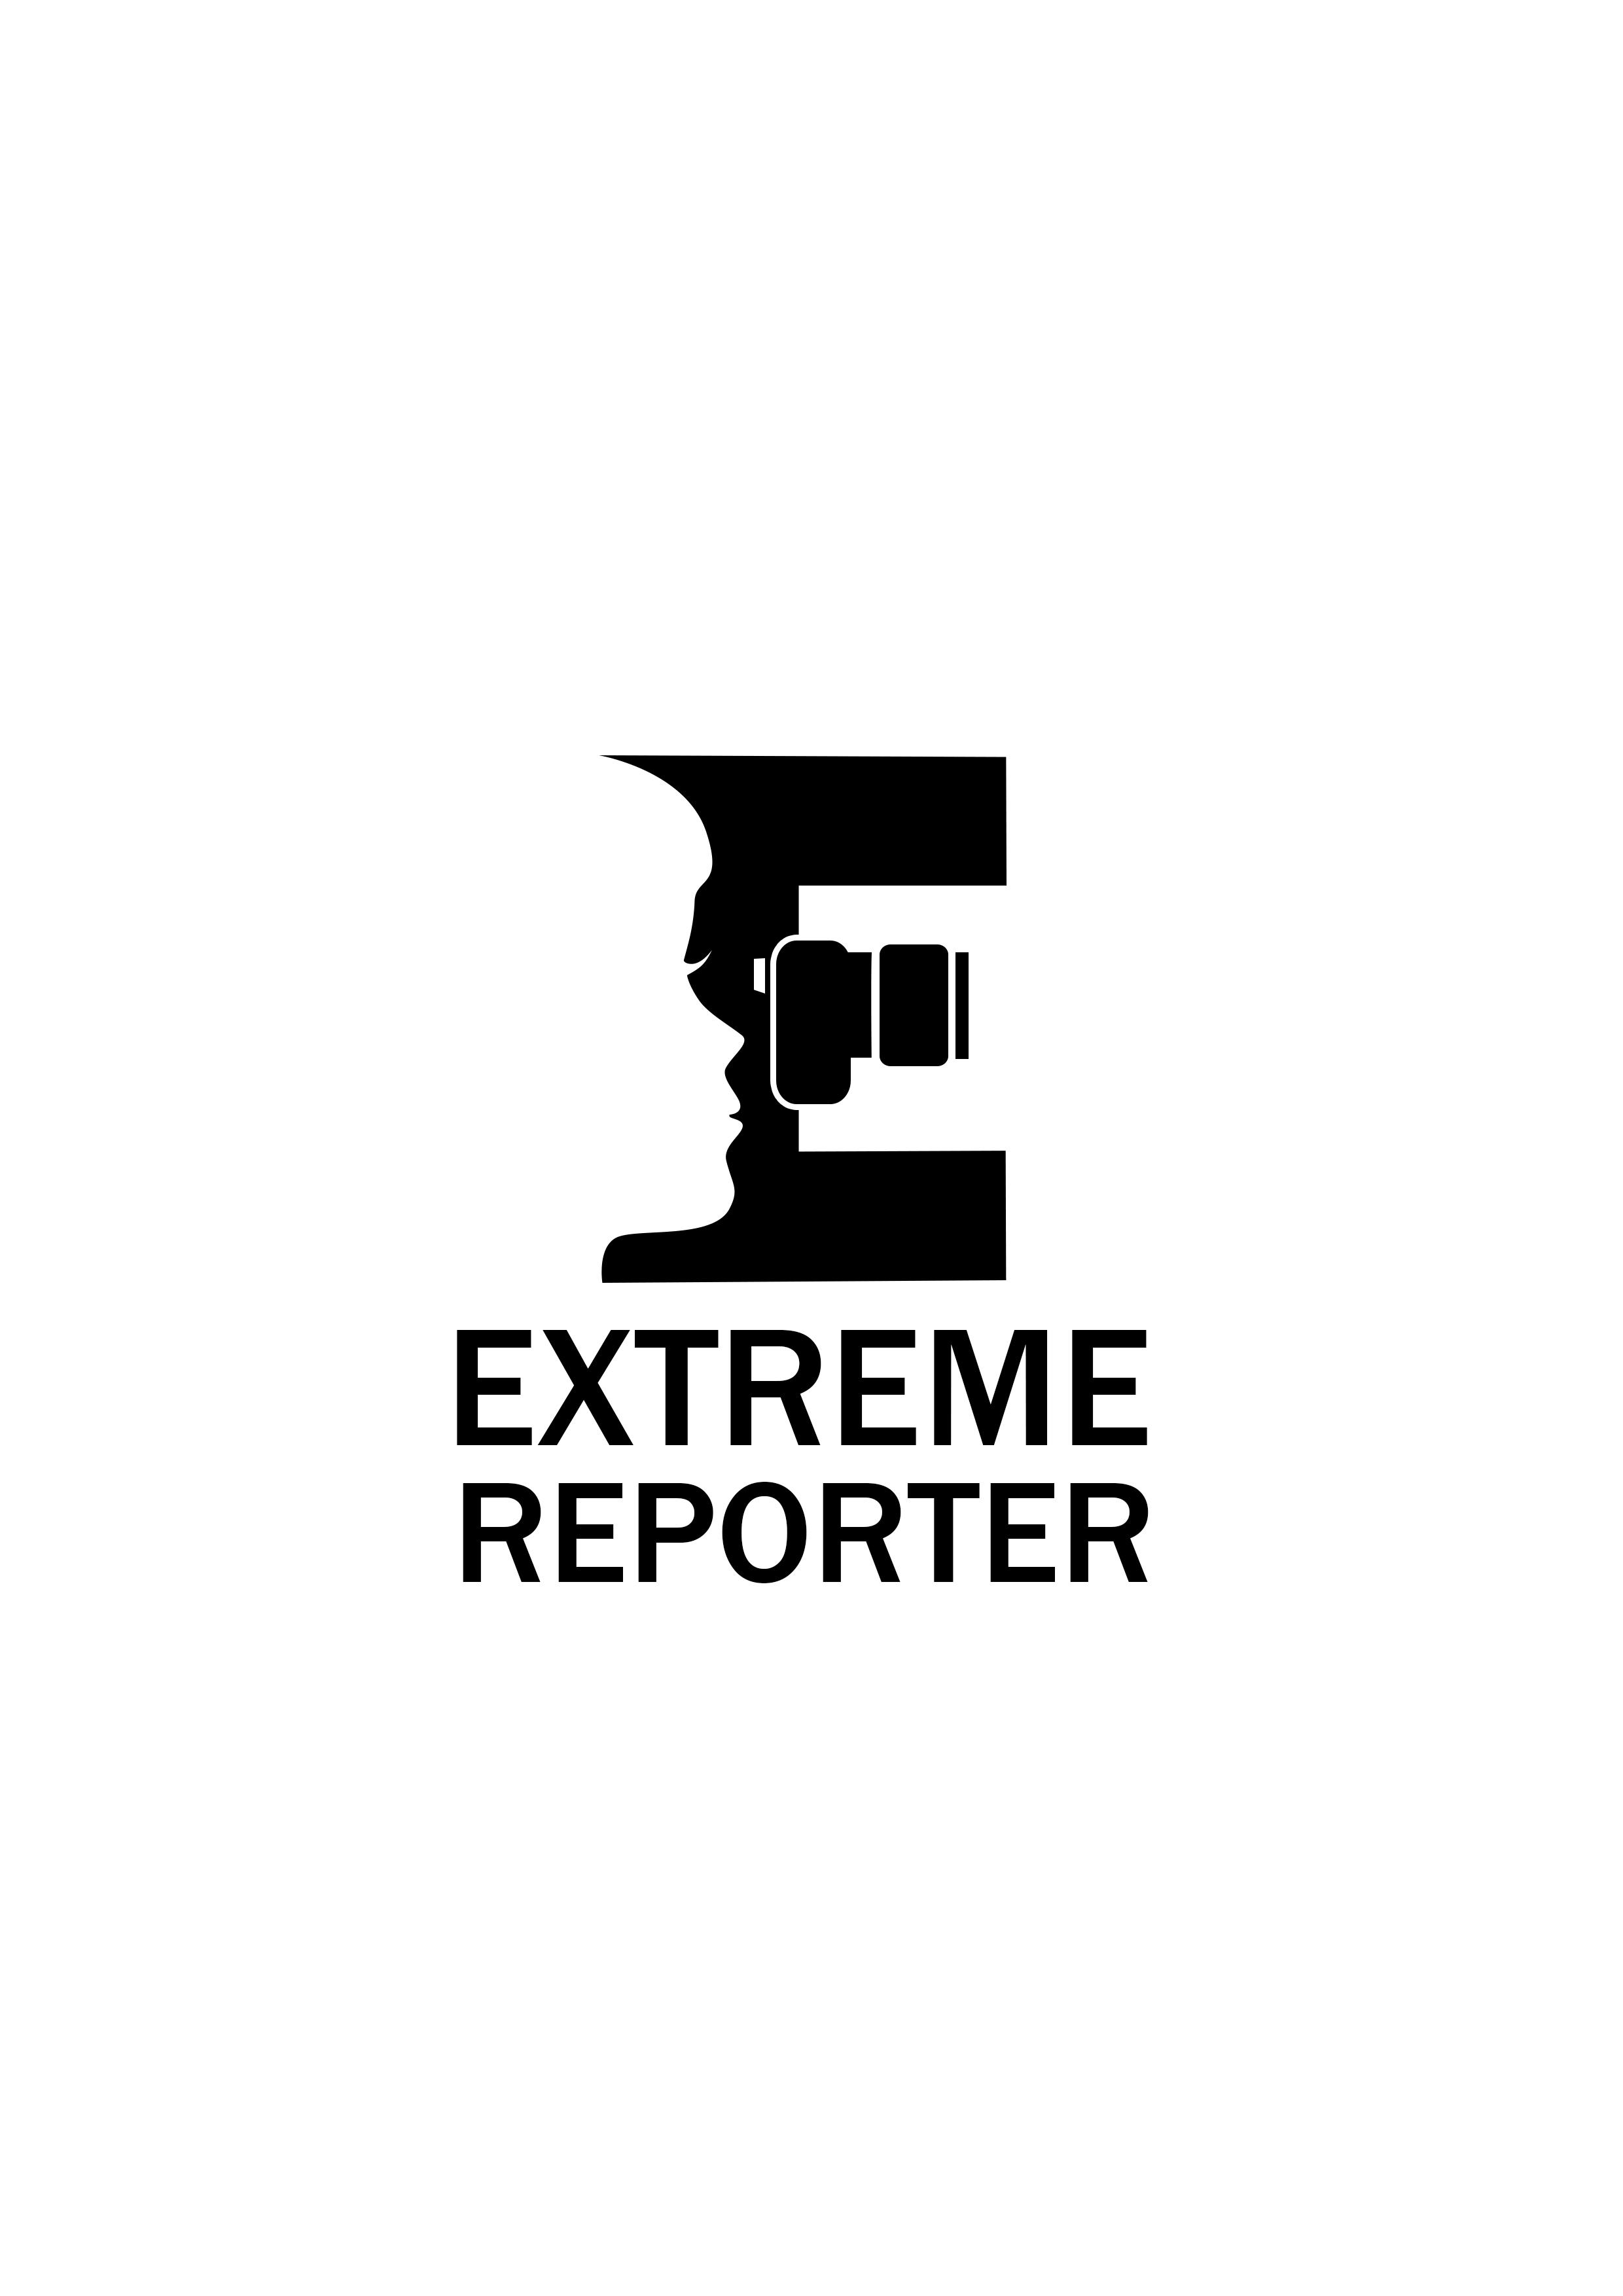 Логотип для экстрим фотографа.  фото f_3735a5515344ed34.jpg